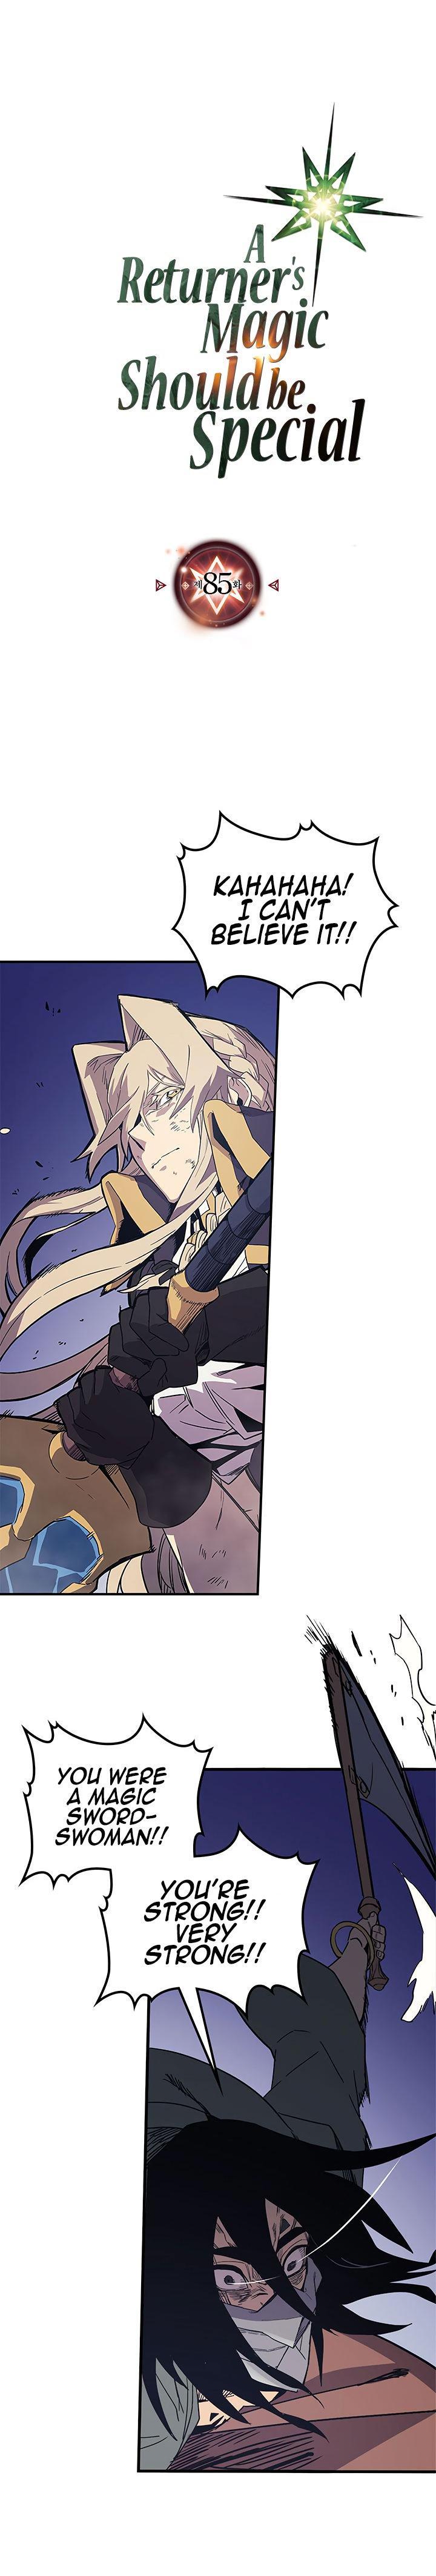 A Returner's Magic Should Be Special Chapter 85 page 1 - Mangakakalots.com